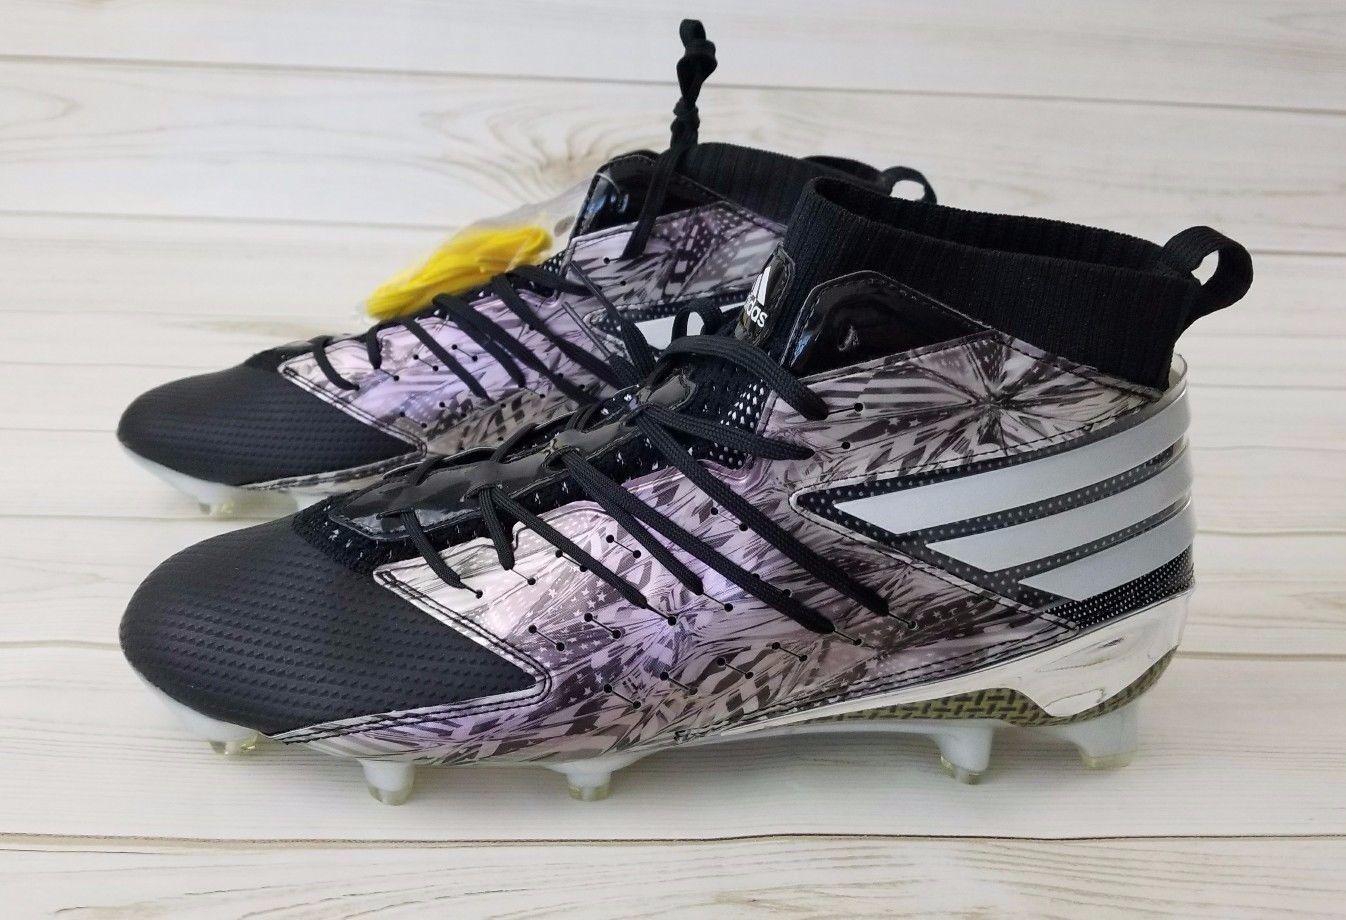 primeknit nouvelles adidas adidas adidas x monstre kevlar crampons aq8796 carbone noir taille 13 556317